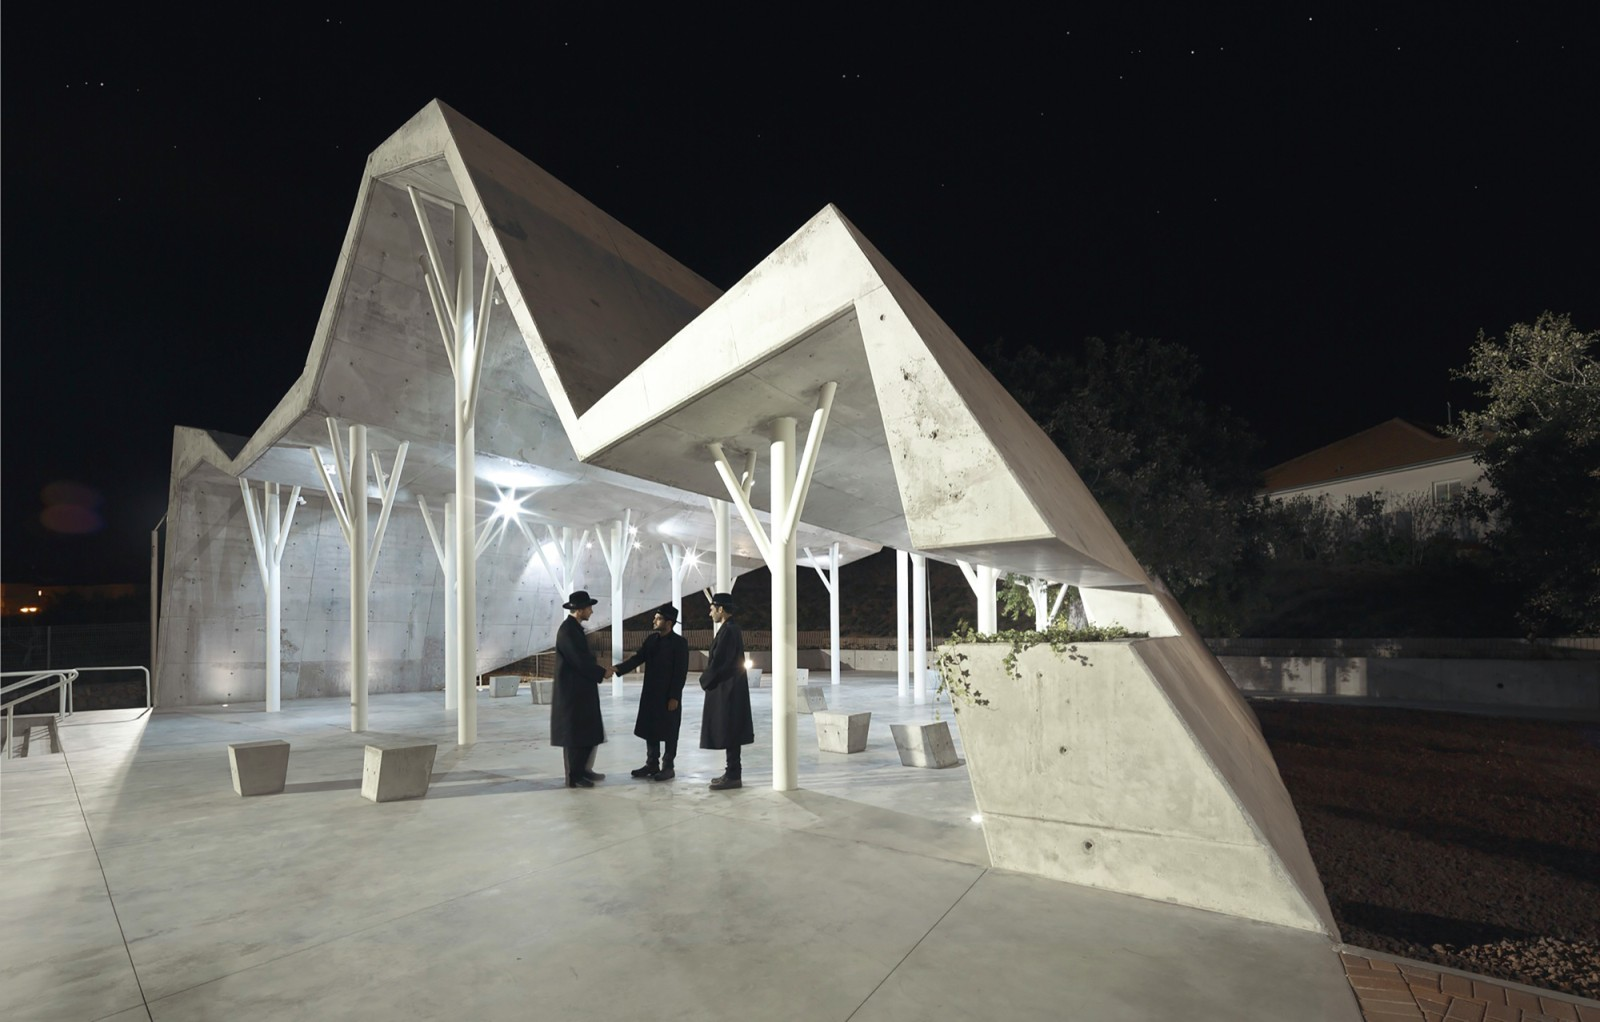 Open-sided shelter